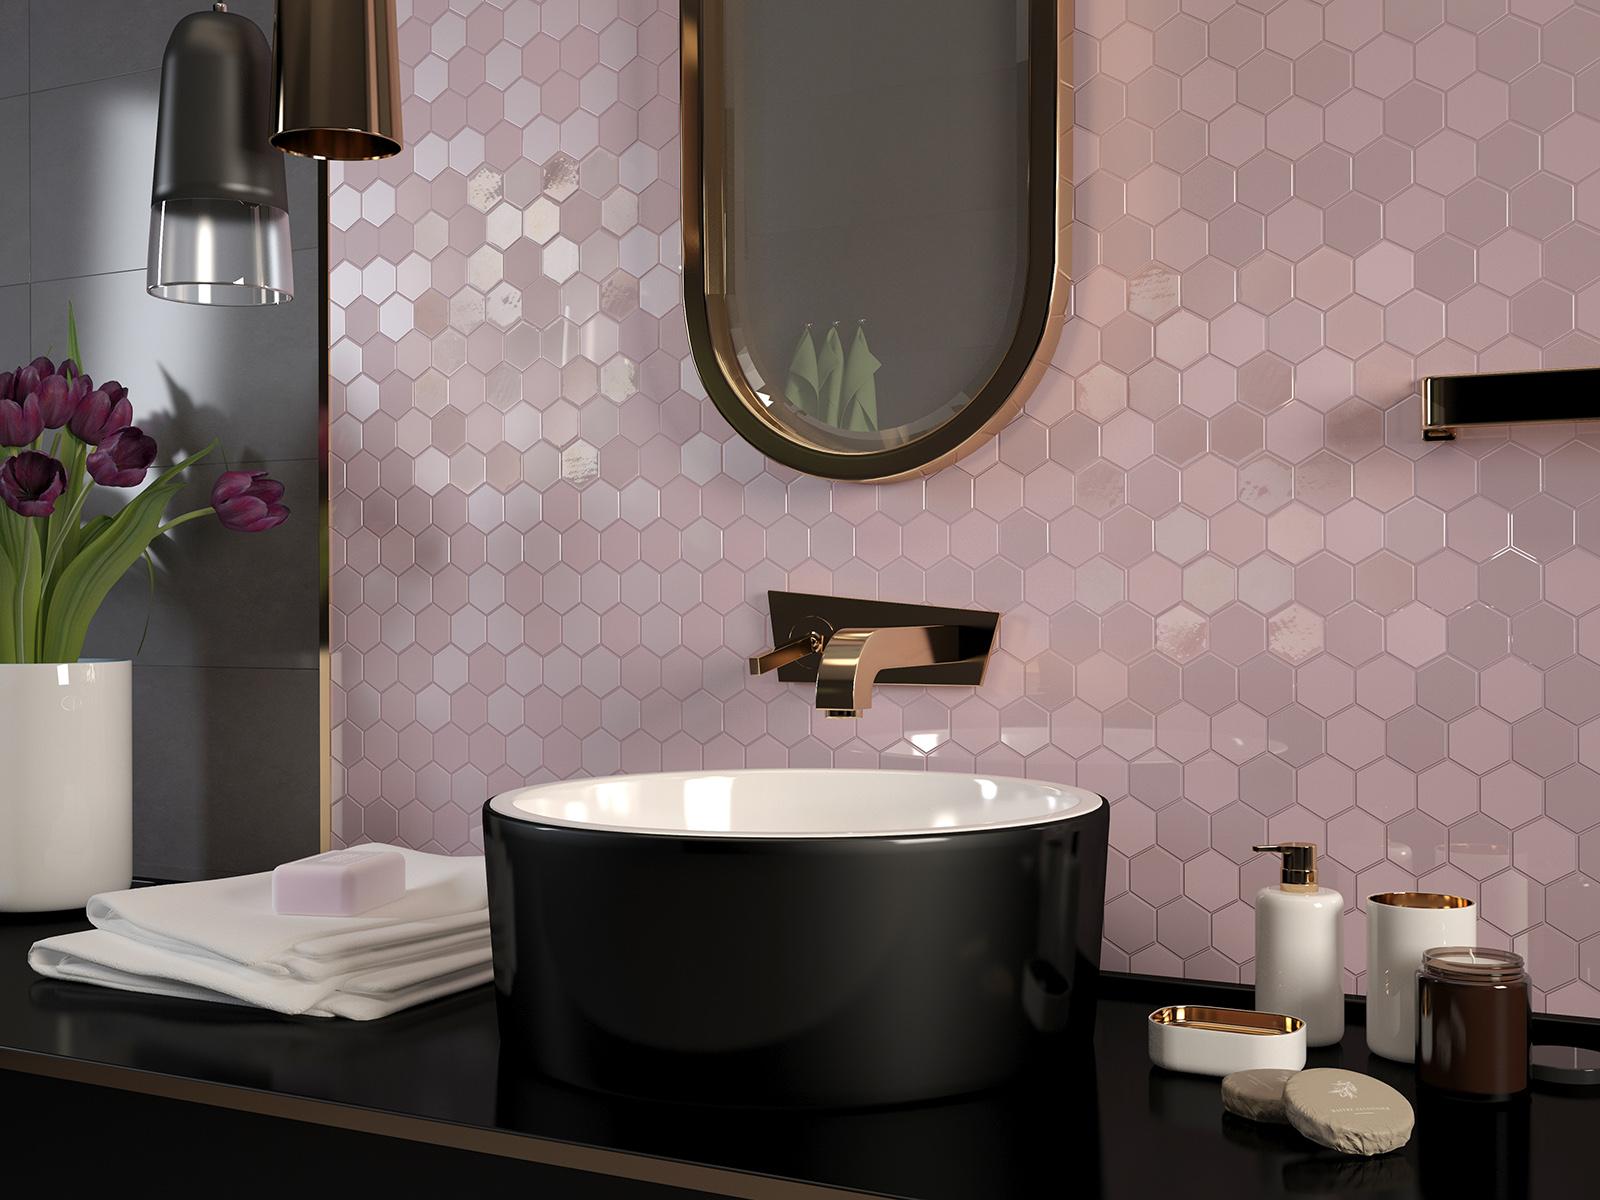 Mijn-bad-in-stijl-soft-pop-look-badkamer-wasbak